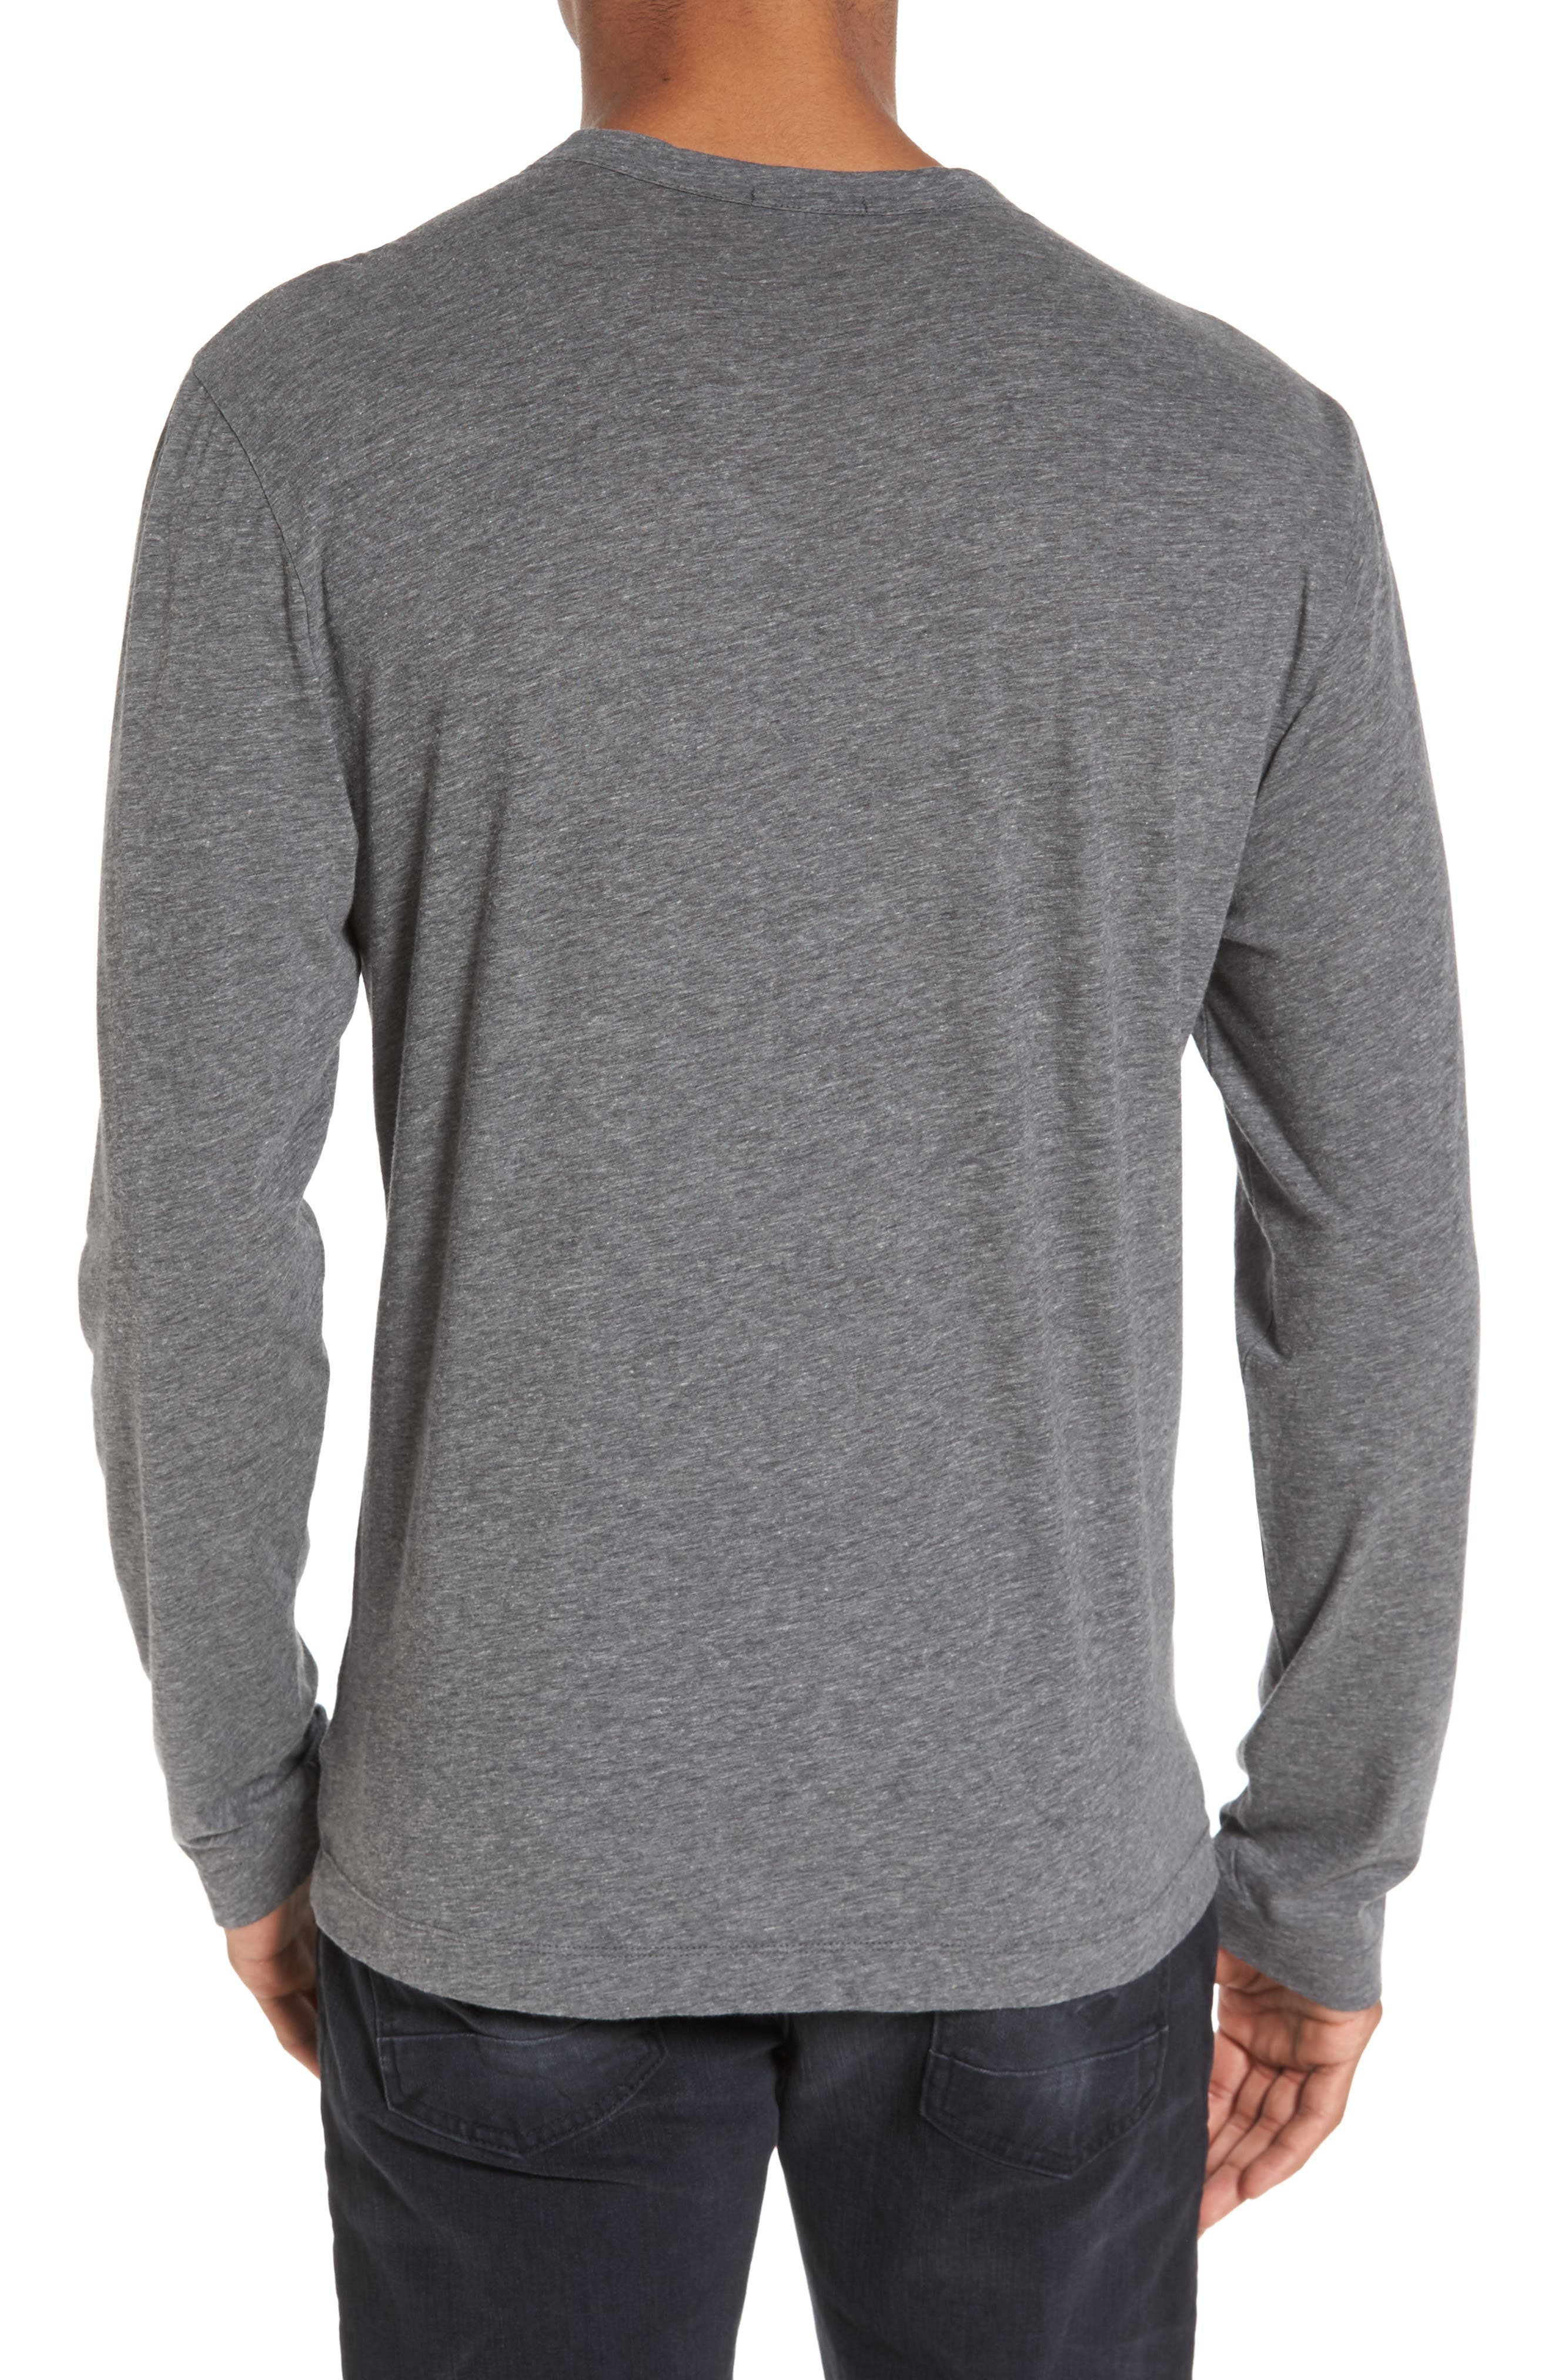 Alternate Image 2  - James Perse Mélange Knit Long Sleeve T-Shirt